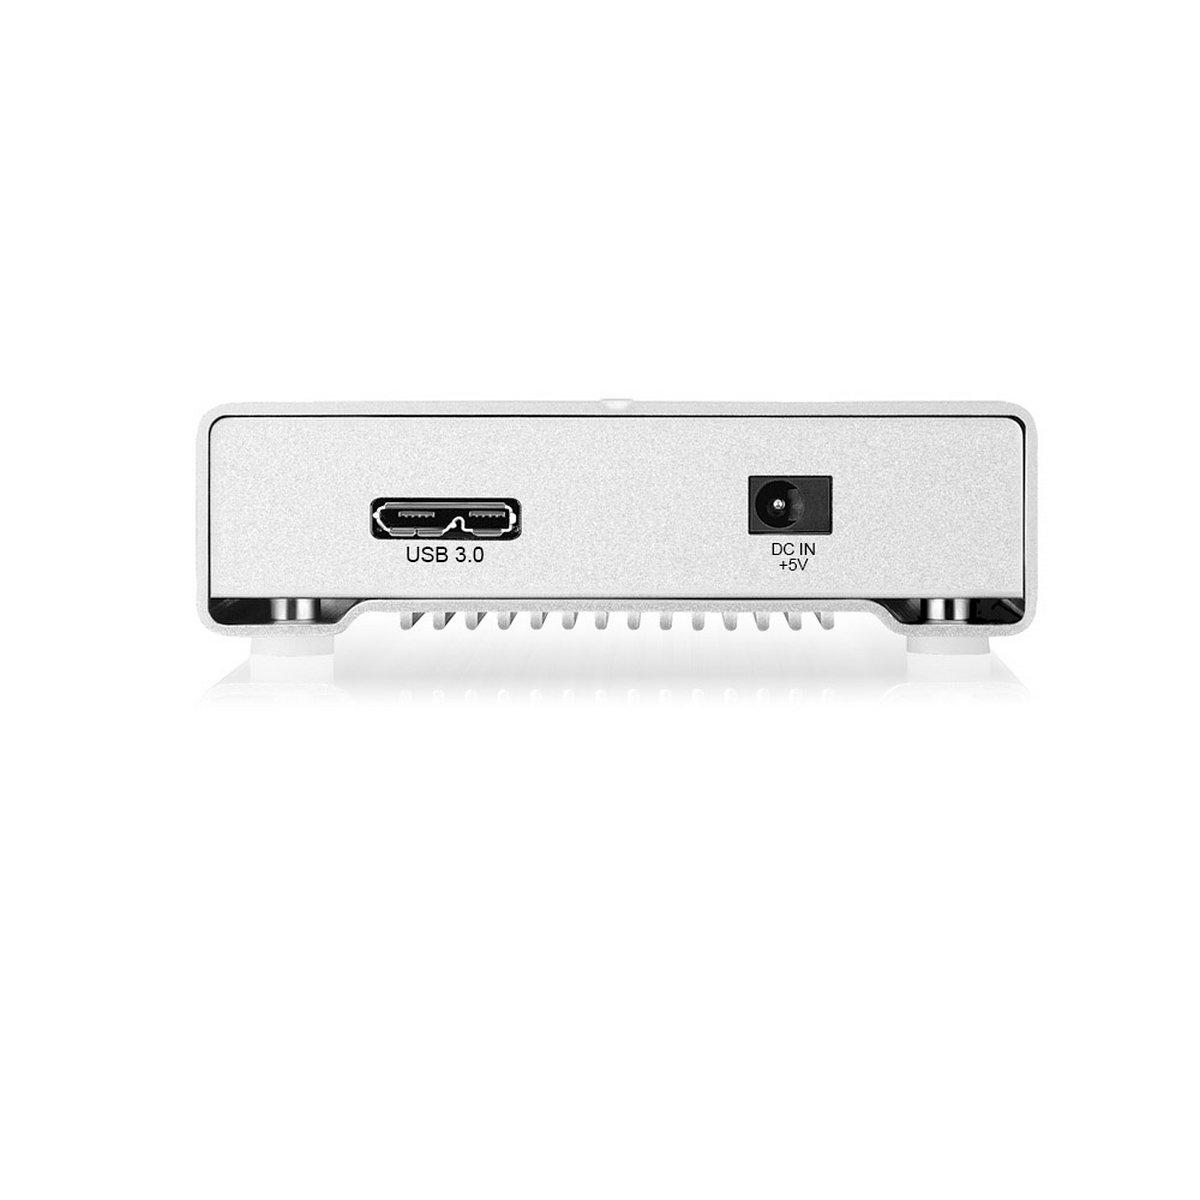 AKiTiO SK2-U3AS-AKTH | Neutrino U3 Laptop 1TB External Hard Drive